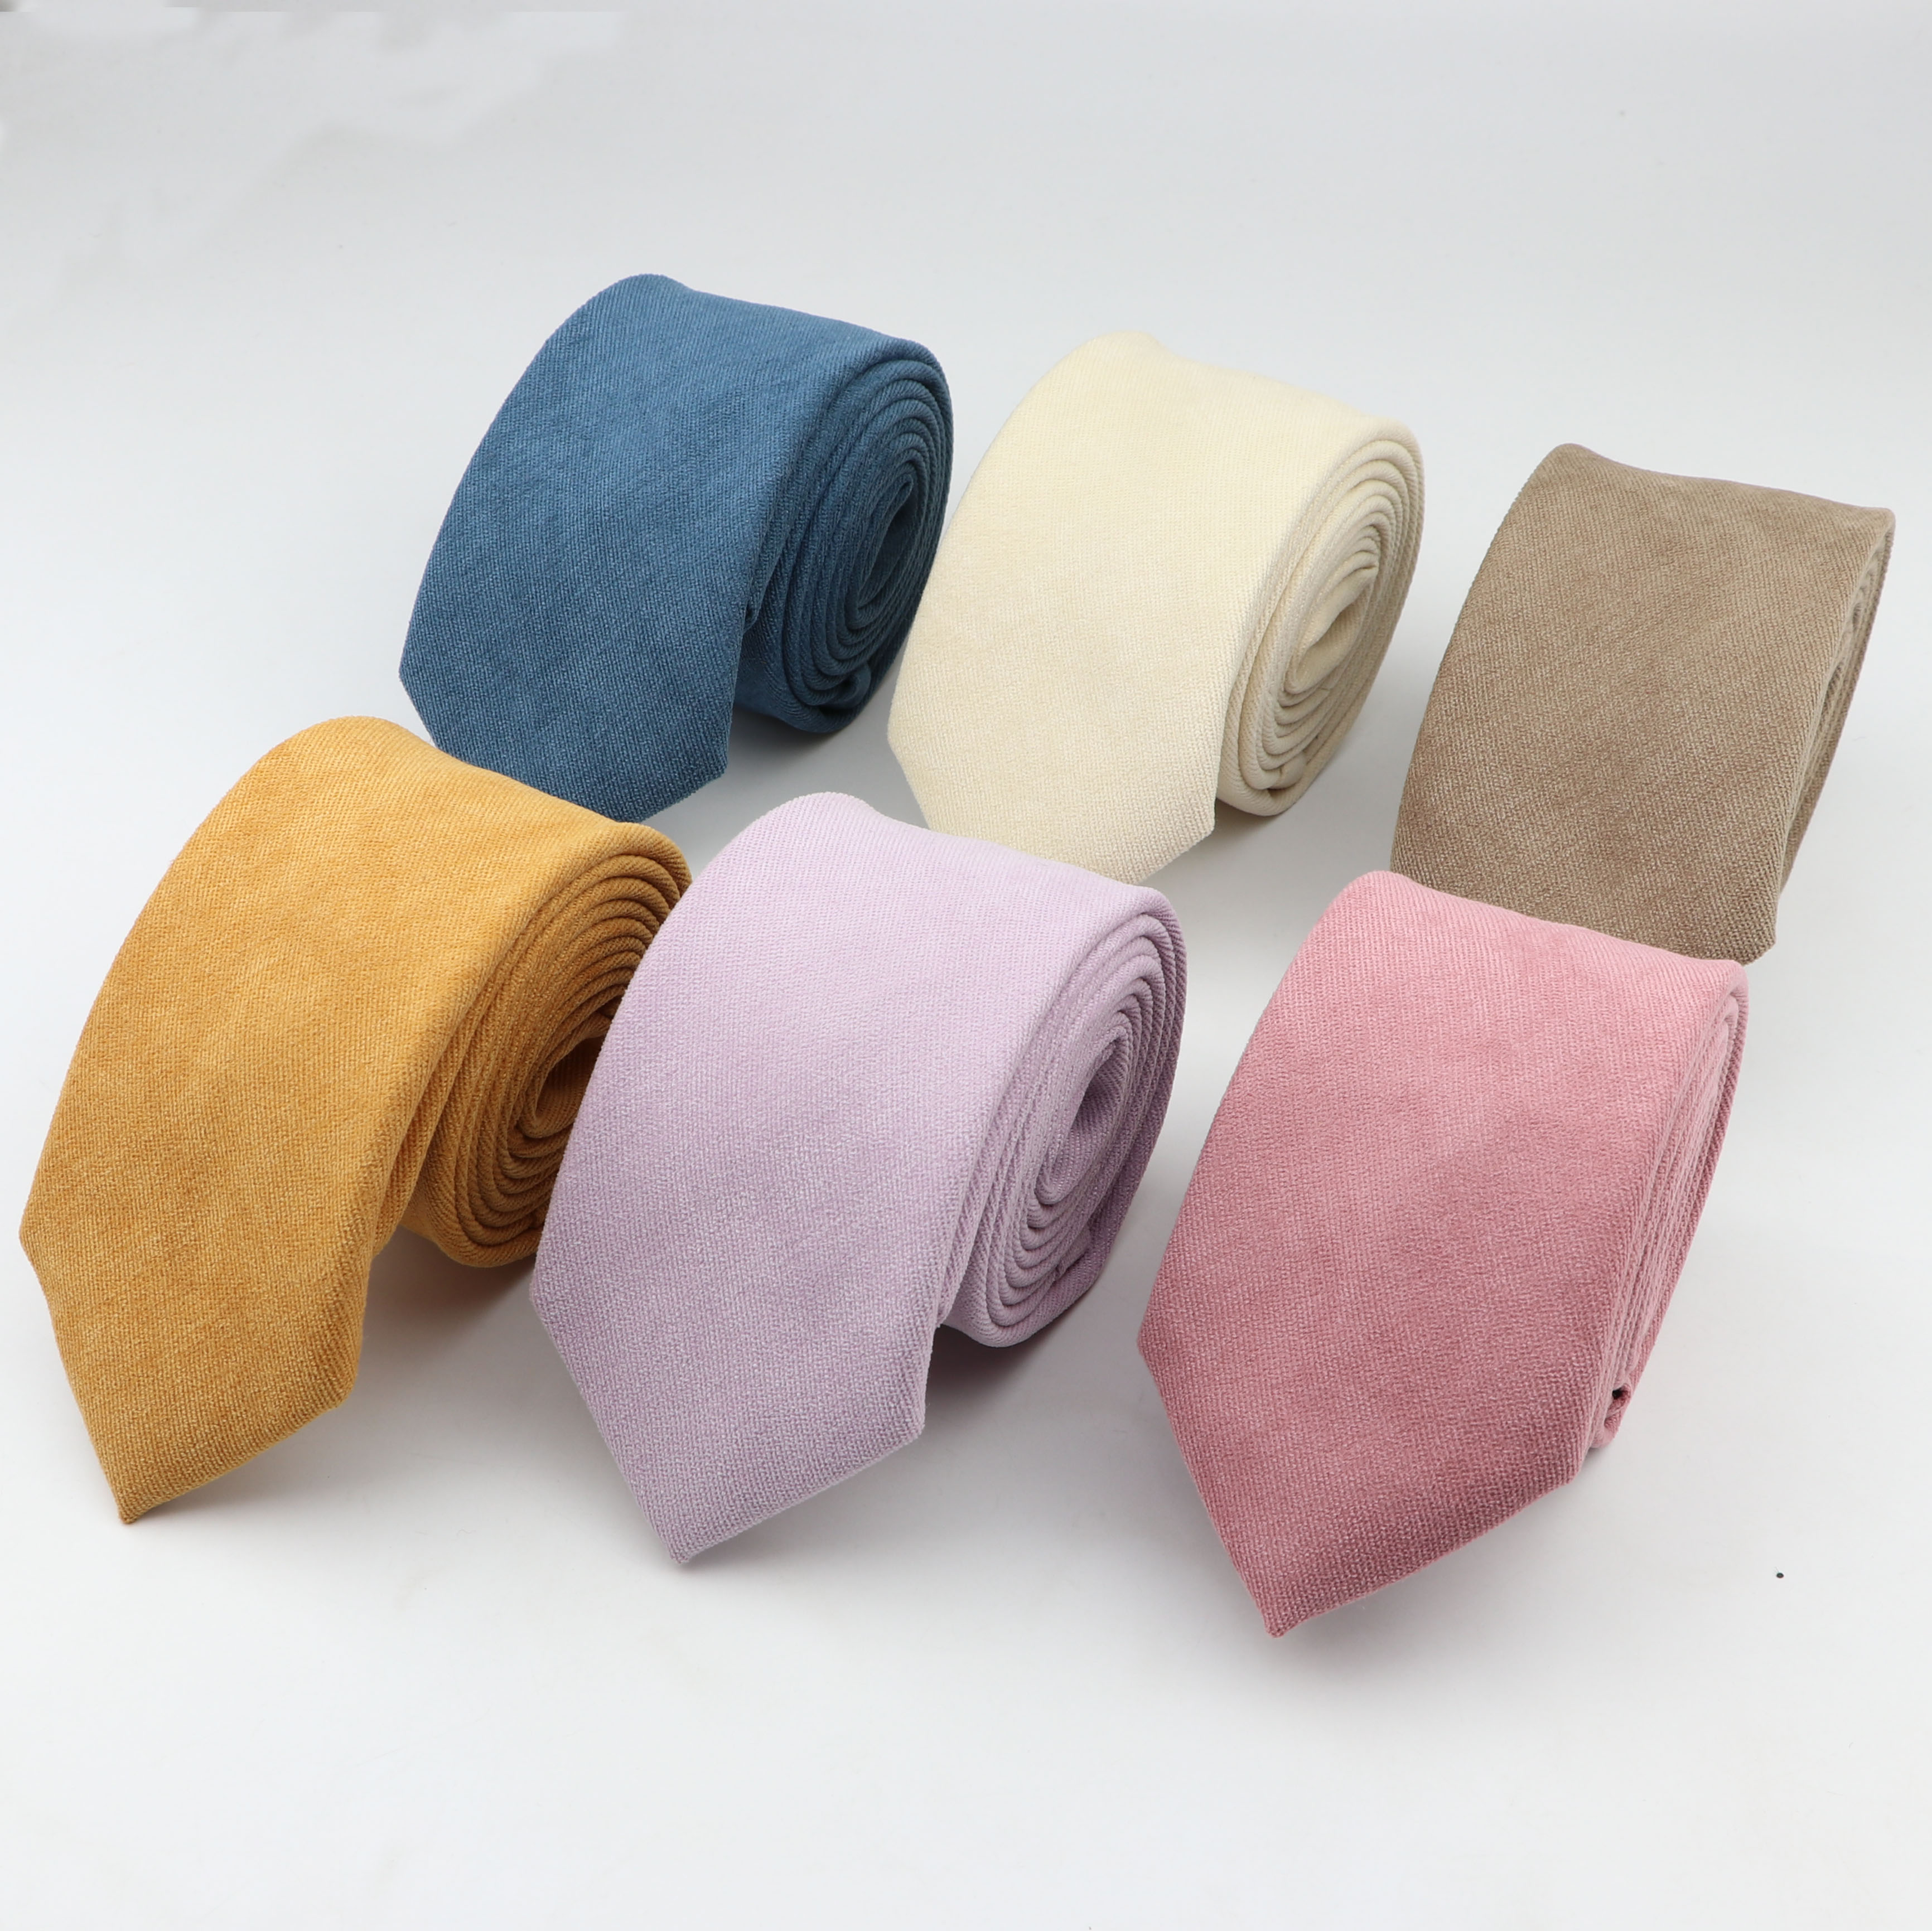 Soft Microsuede Ties Men's Solid Color Tie Narrow 7cm Width Necktie Slim Skinny Cravate Thick Neckties